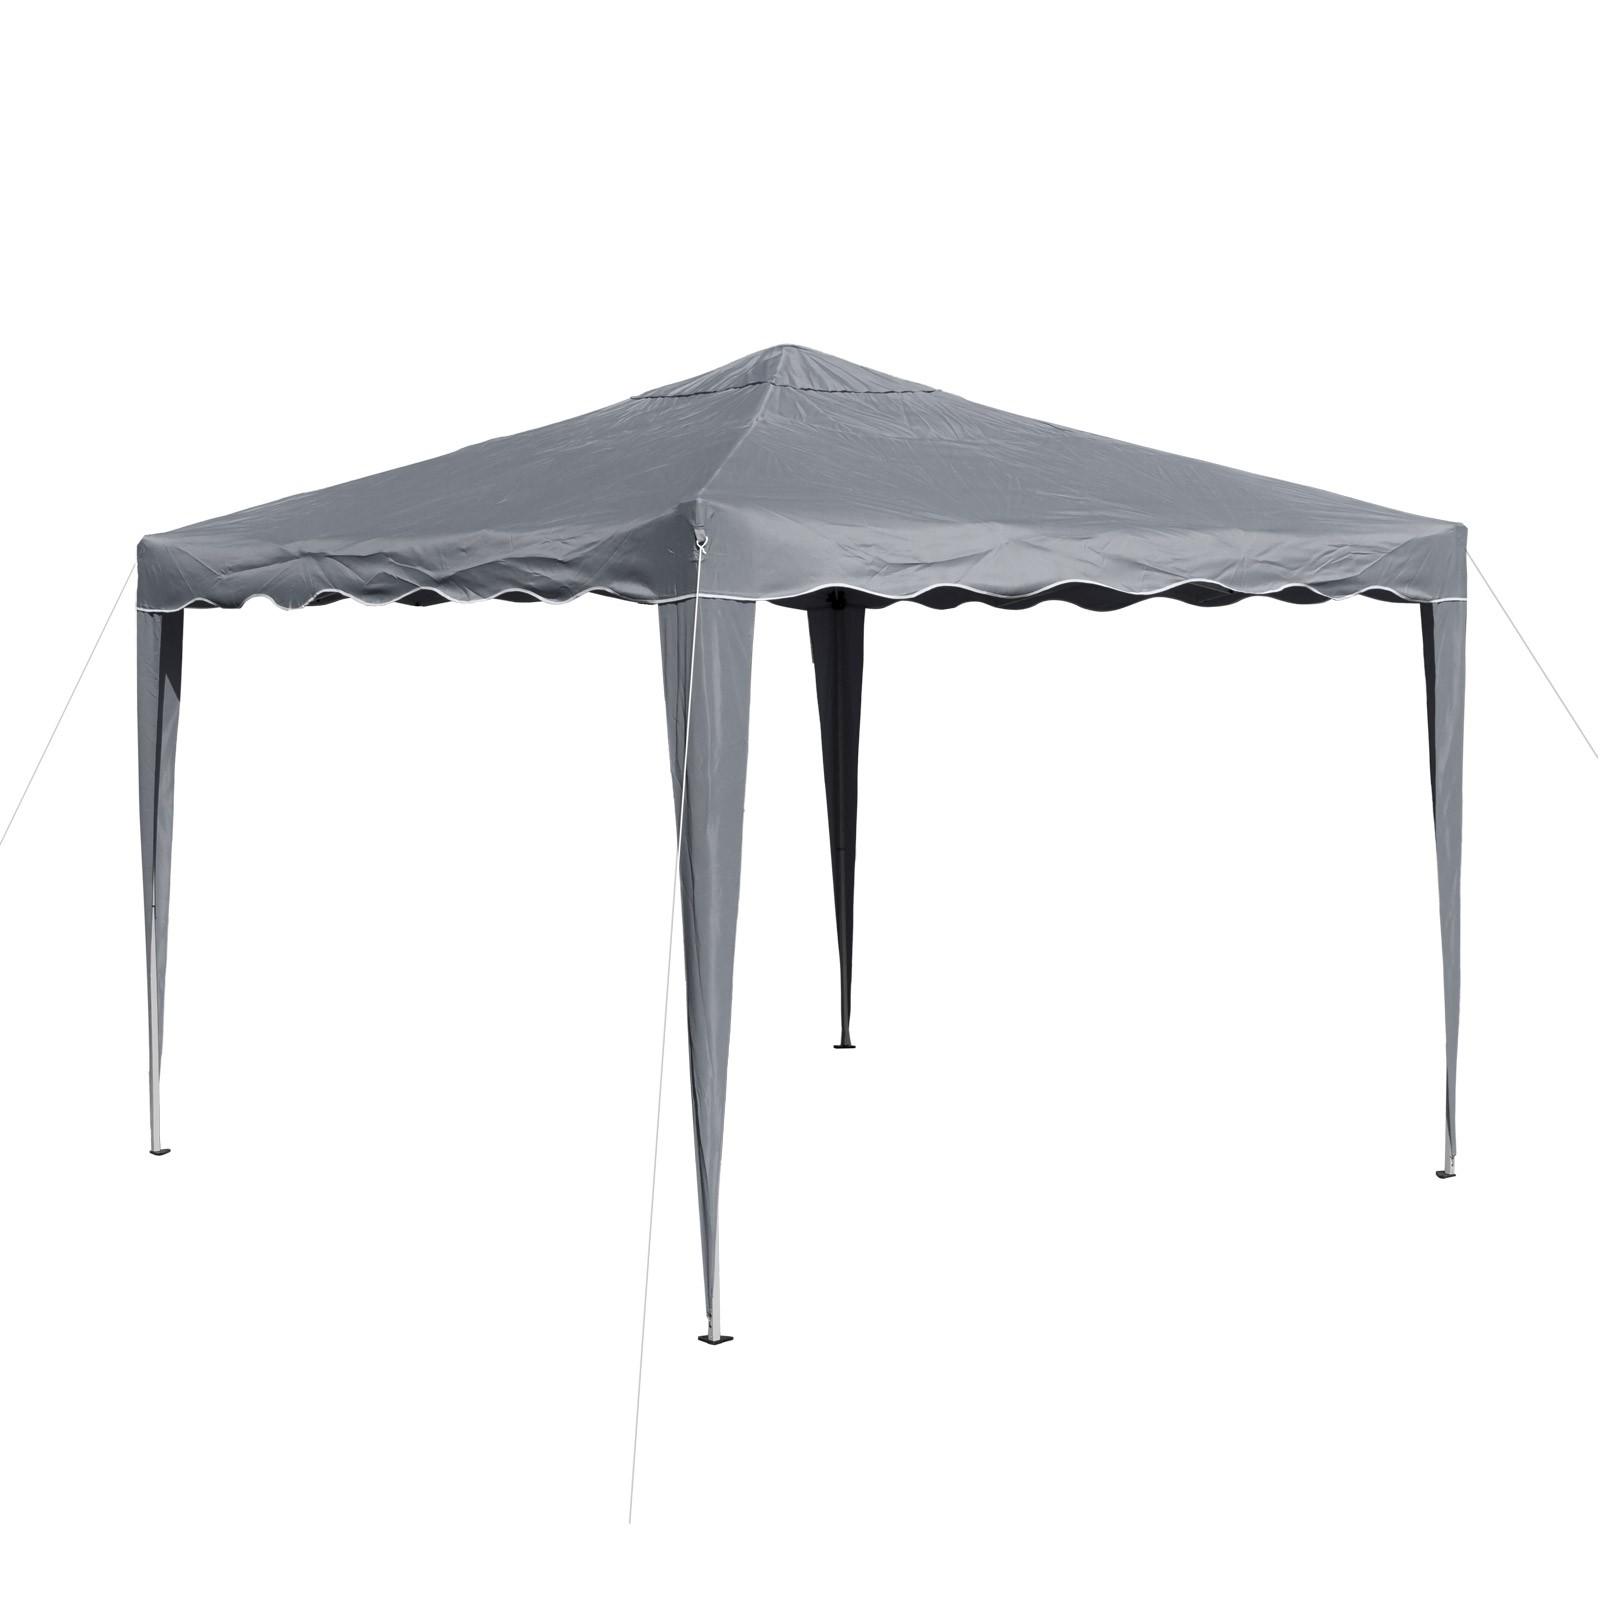 gartenpavillon faltpavillon alu metall 3x3 meter grau gartenzelt partyzelt ebay. Black Bedroom Furniture Sets. Home Design Ideas